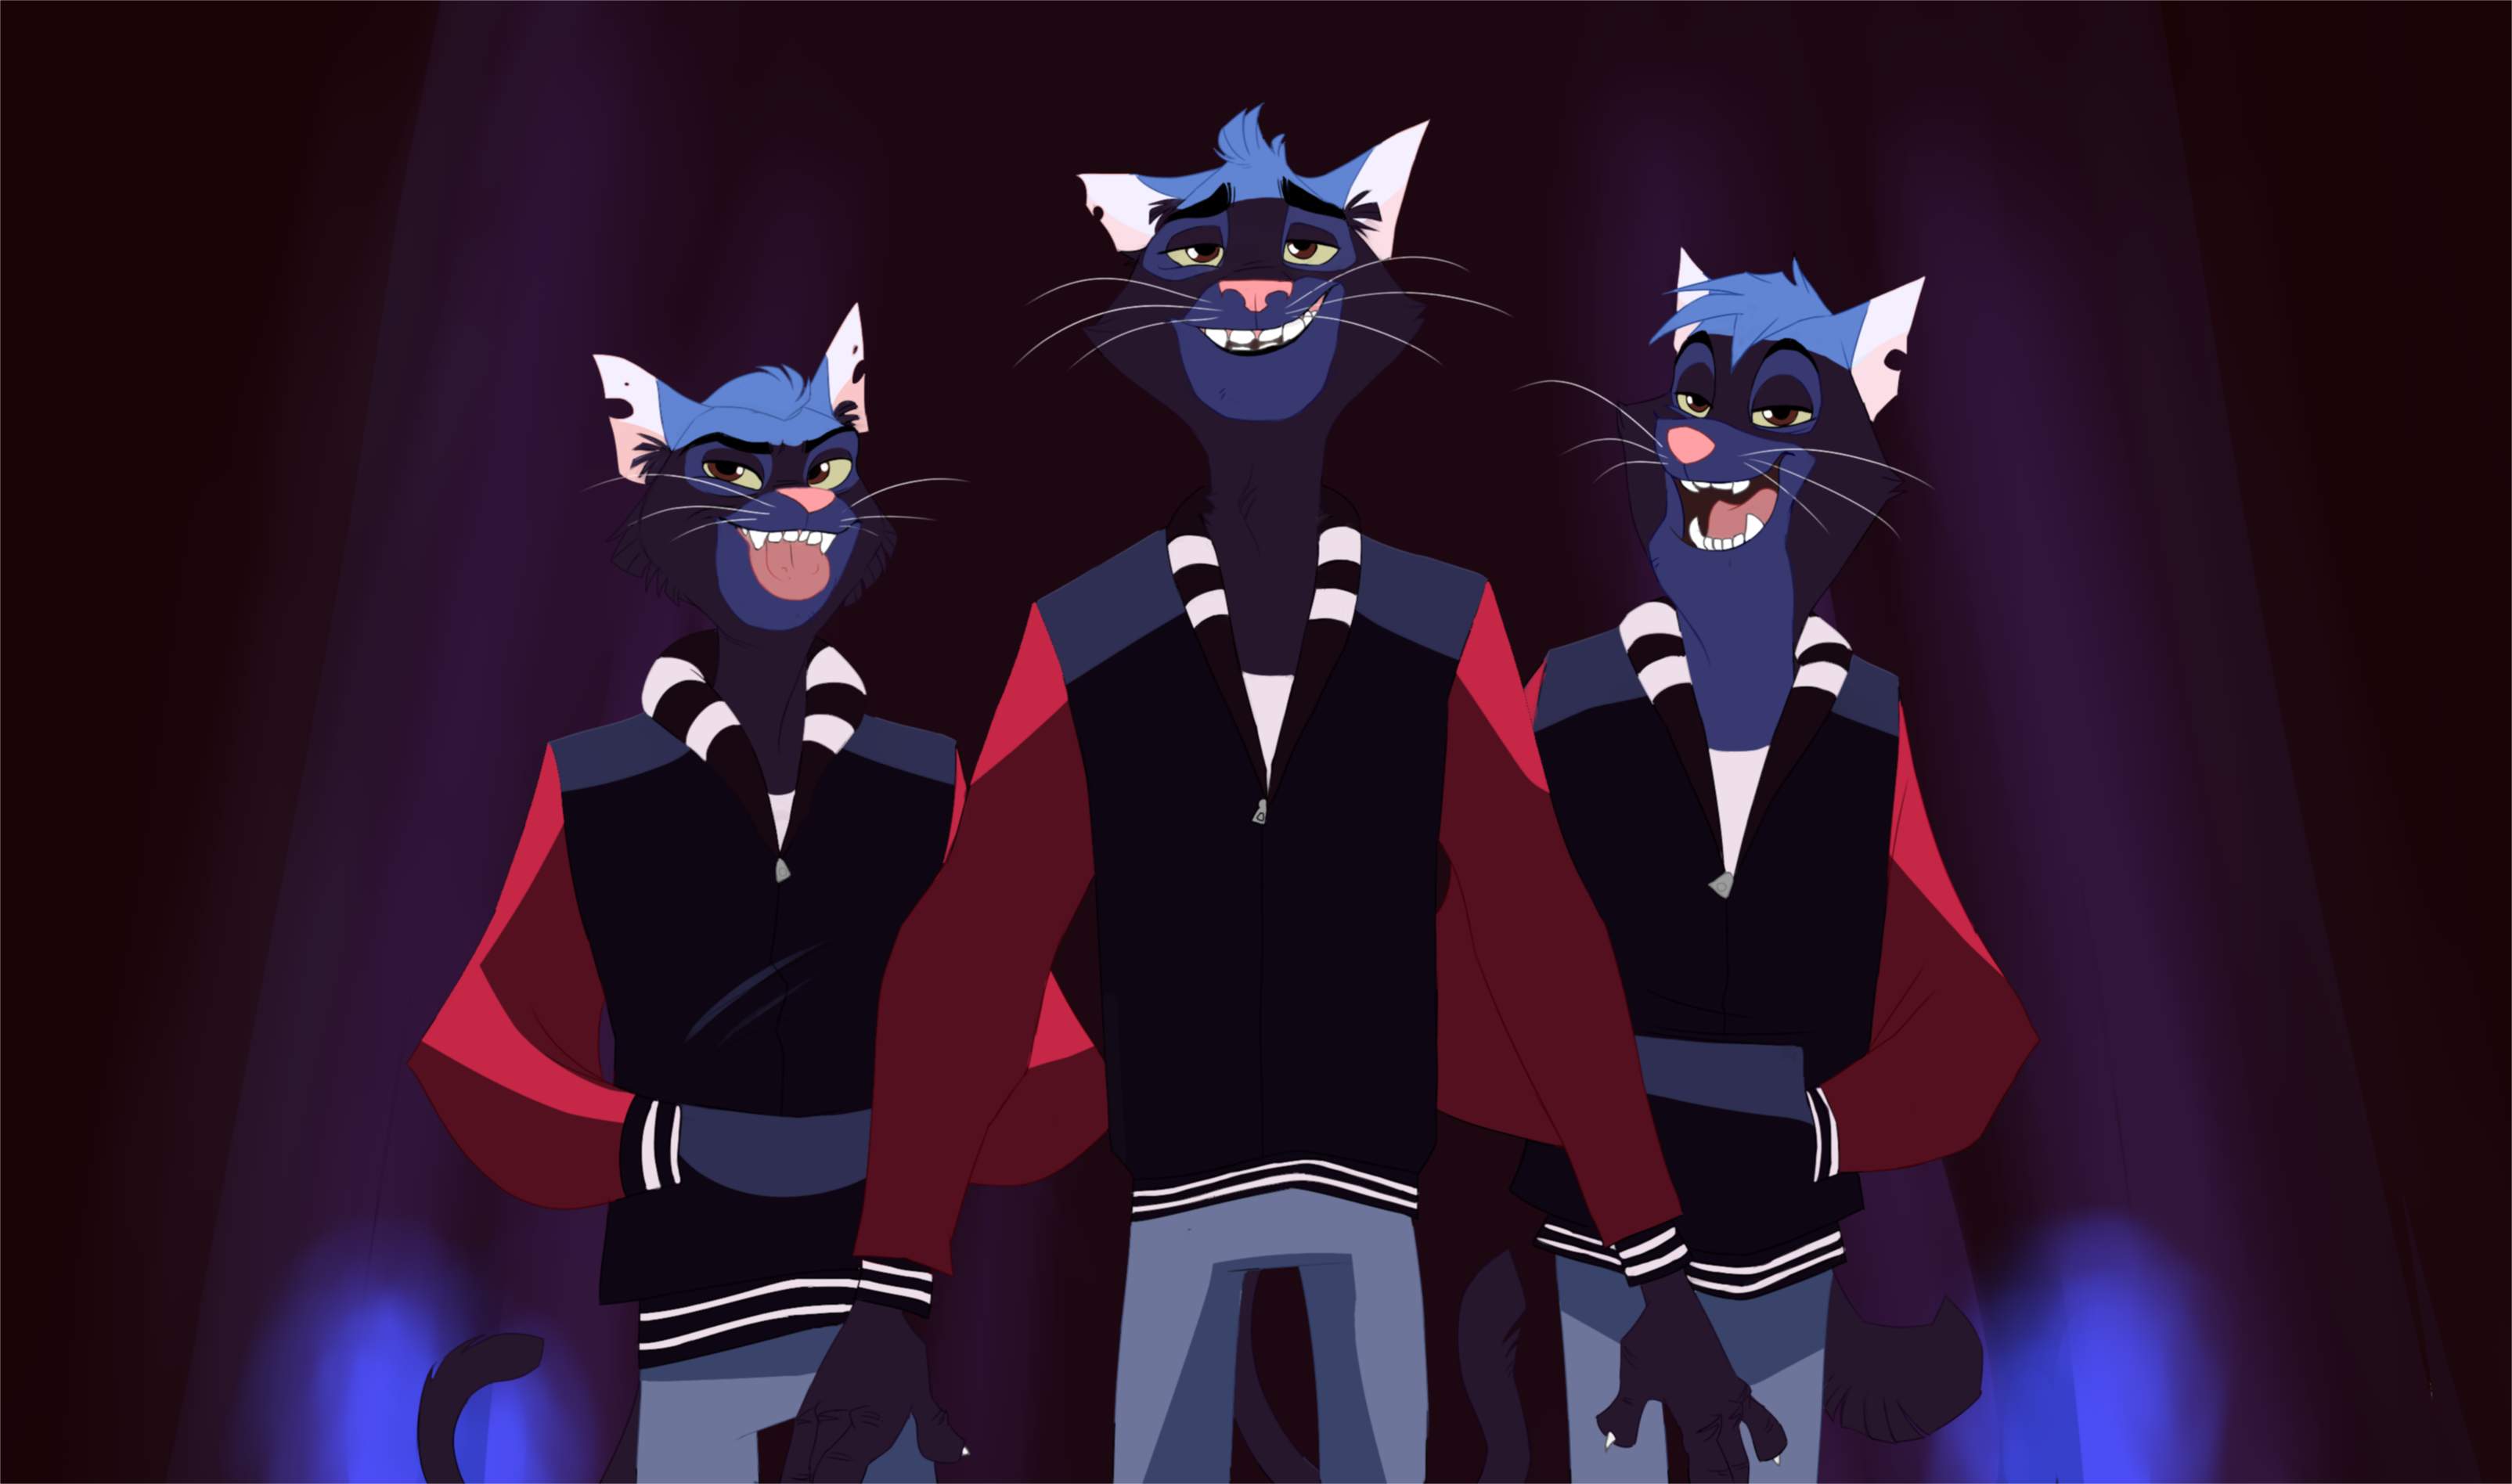 the Blue Cat trio by SuperCrazyHyena on DeviantArt